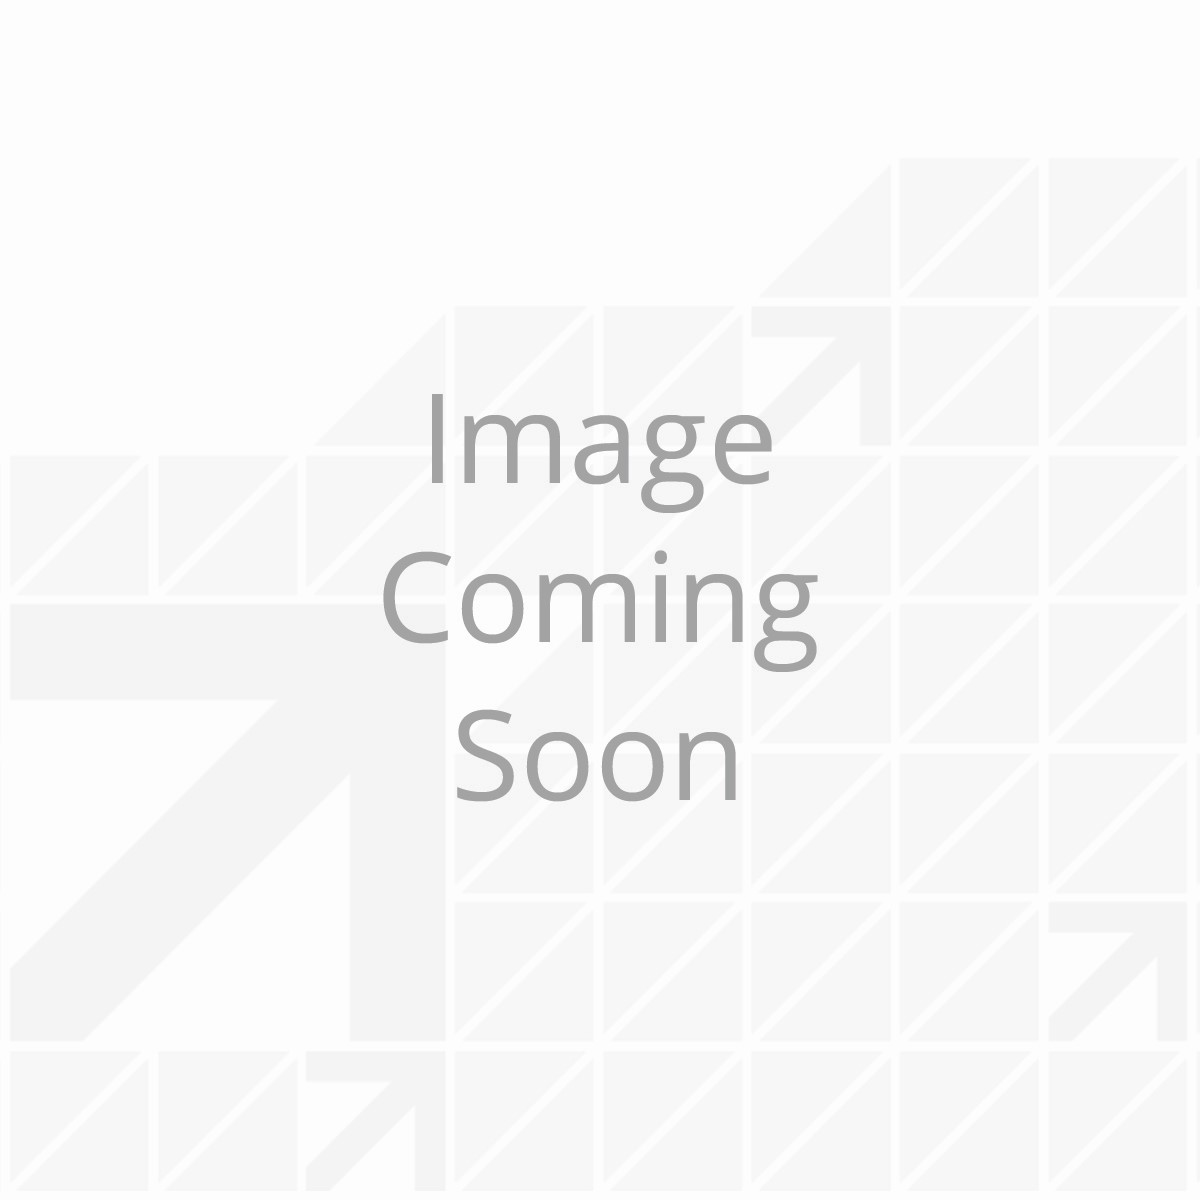 Slimrack Screw #12 - 16 x 1/2 (2010000488)